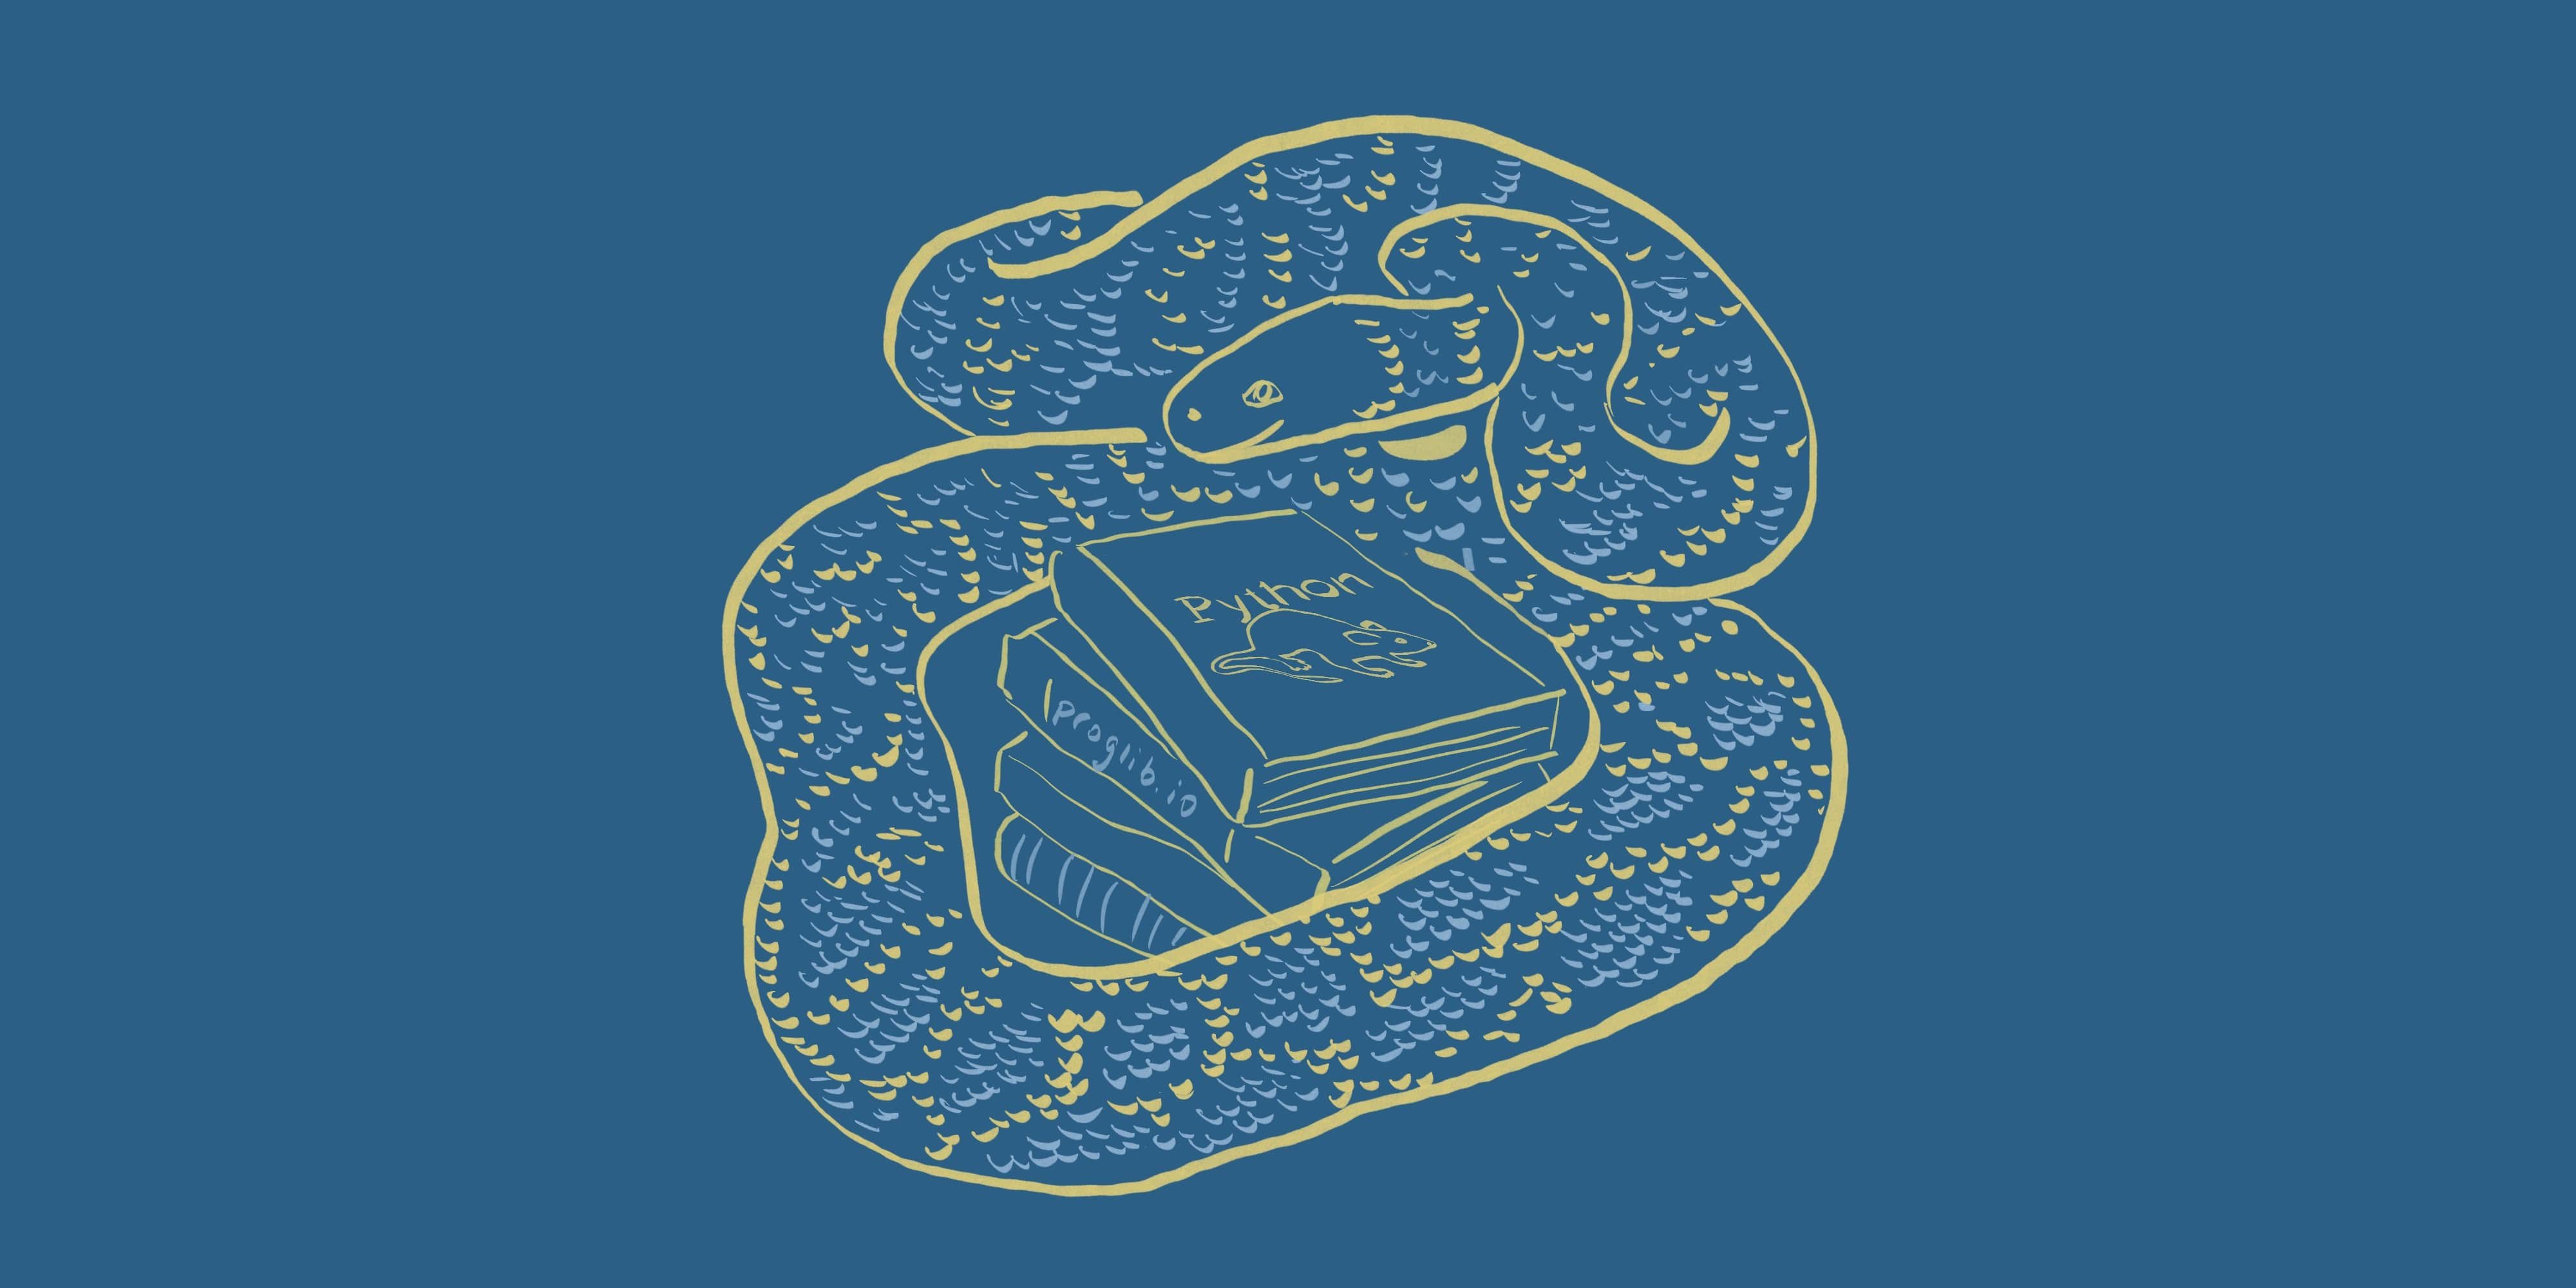 ТОП-15 книг по Python: от новичка до профессионала